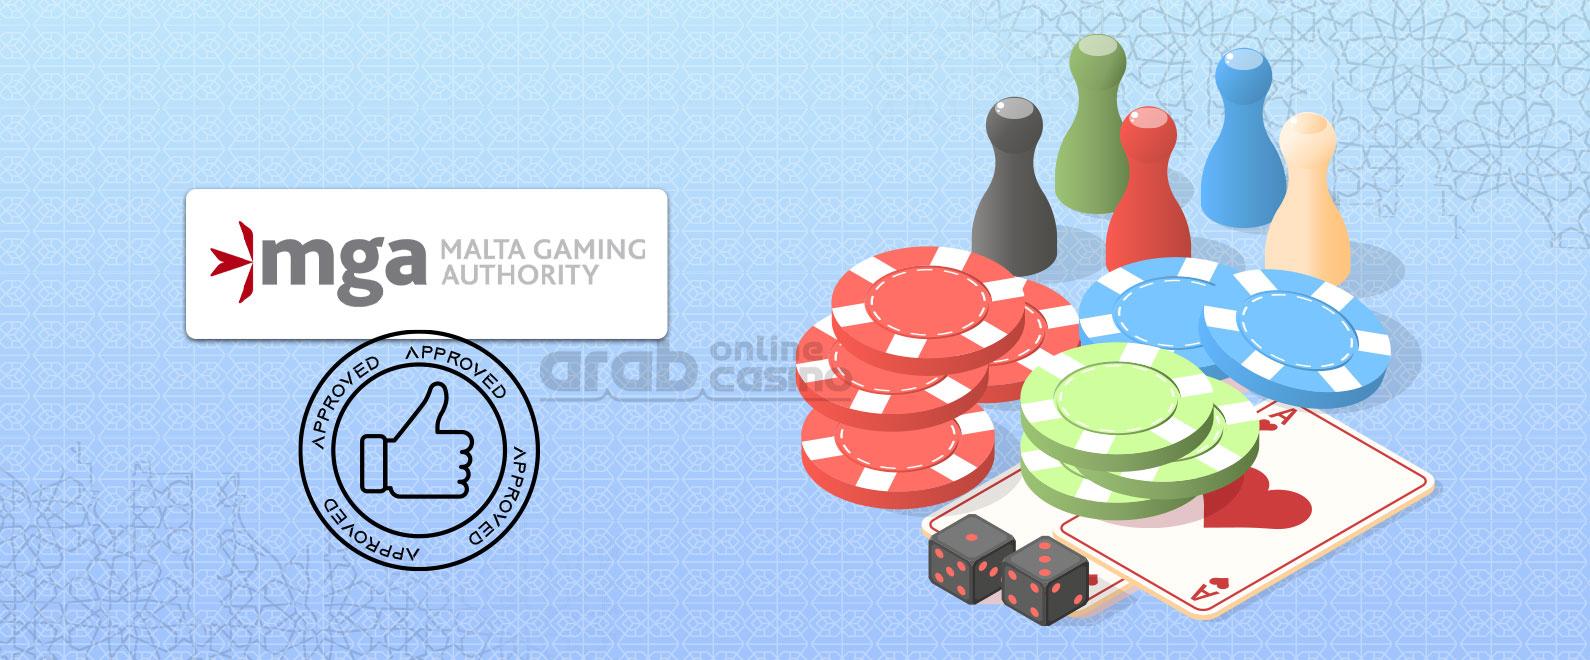 qatar casino sites have mga license